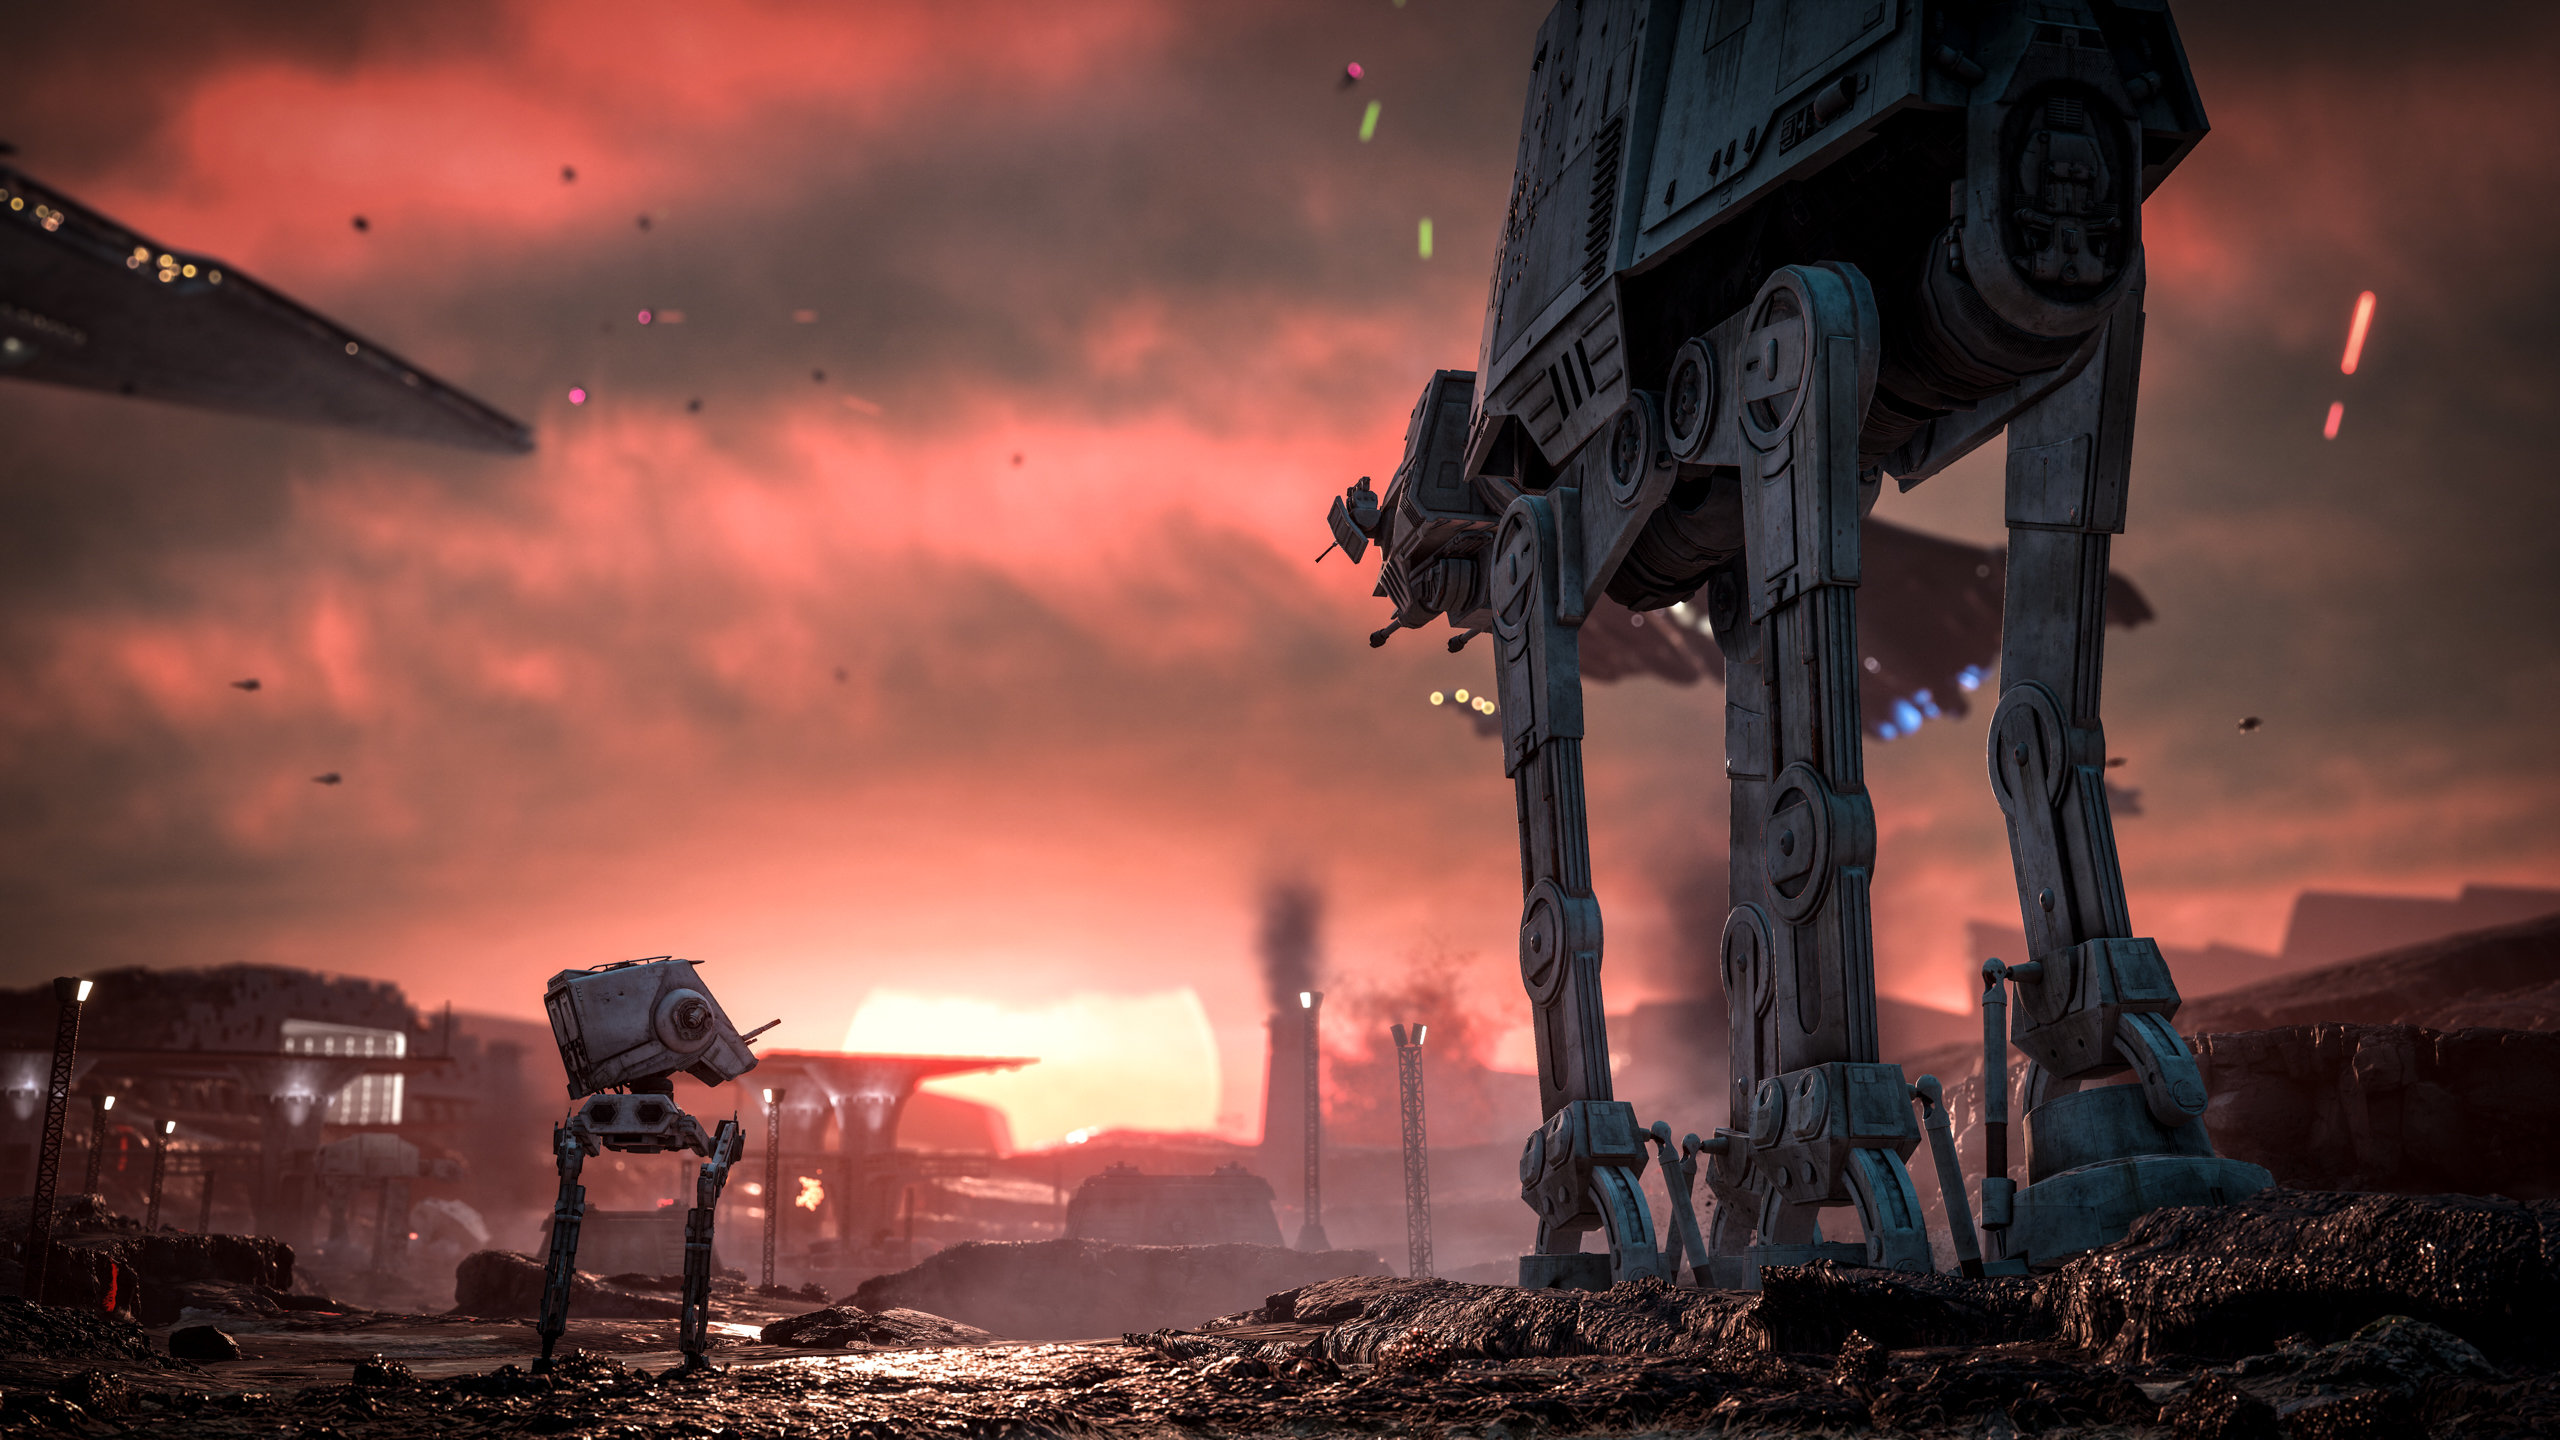 Star Wars Battlefront Wallpapers 2560x1440 Desktop Backgrounds